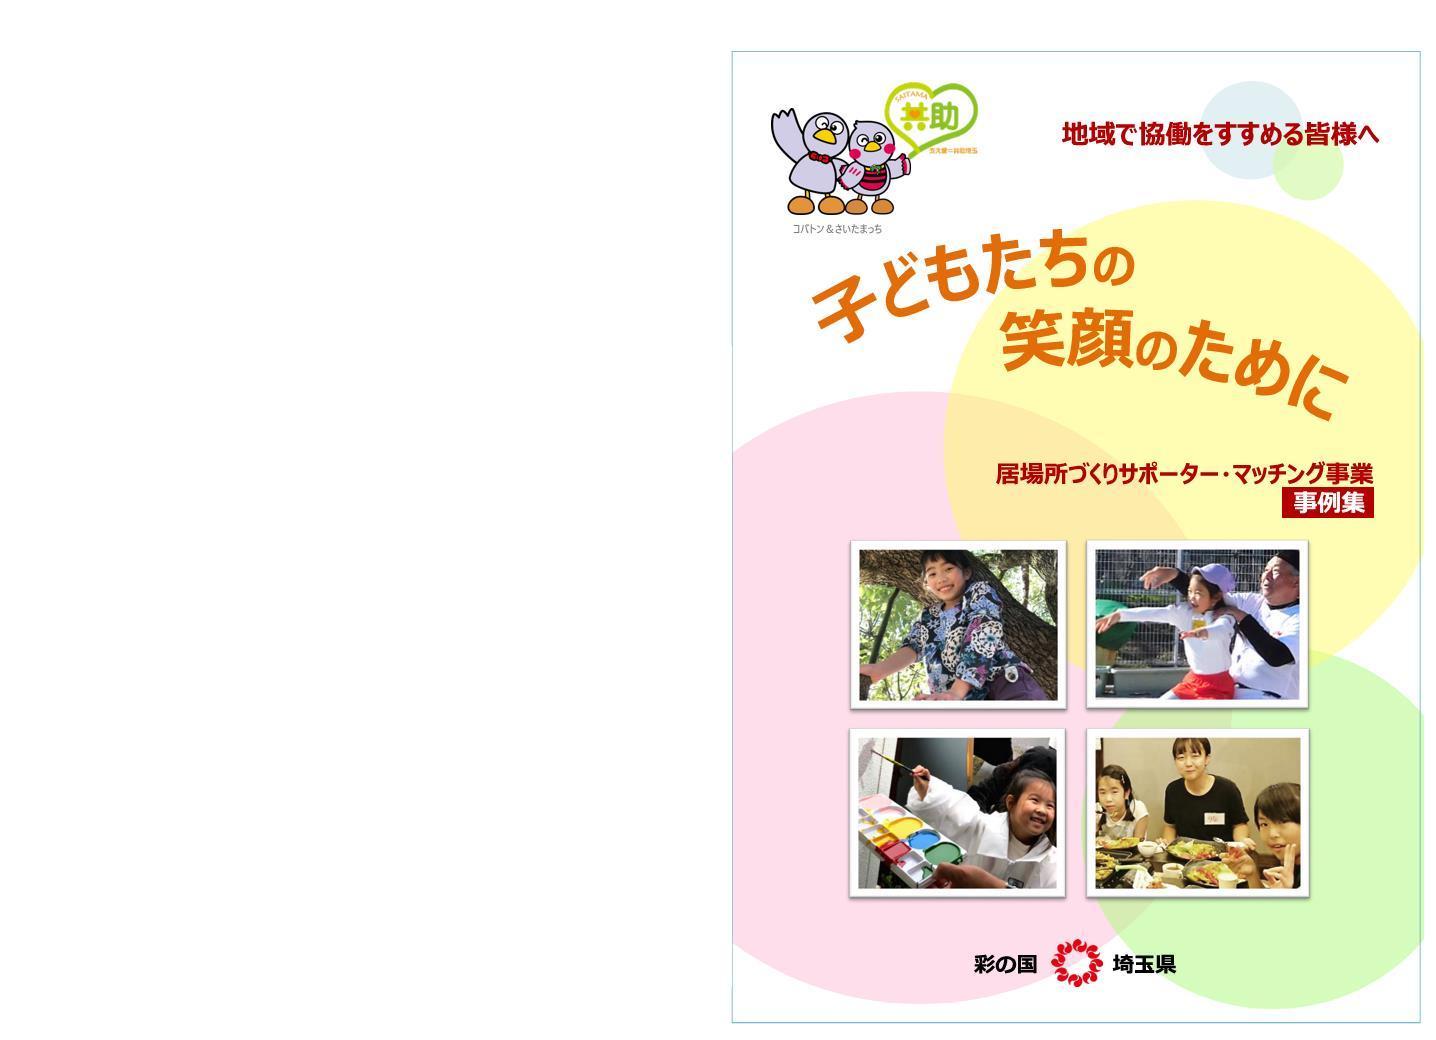 http://kyojo.saitamaken-npo.net/matching/images/ibashojirei_hyousi.jpg